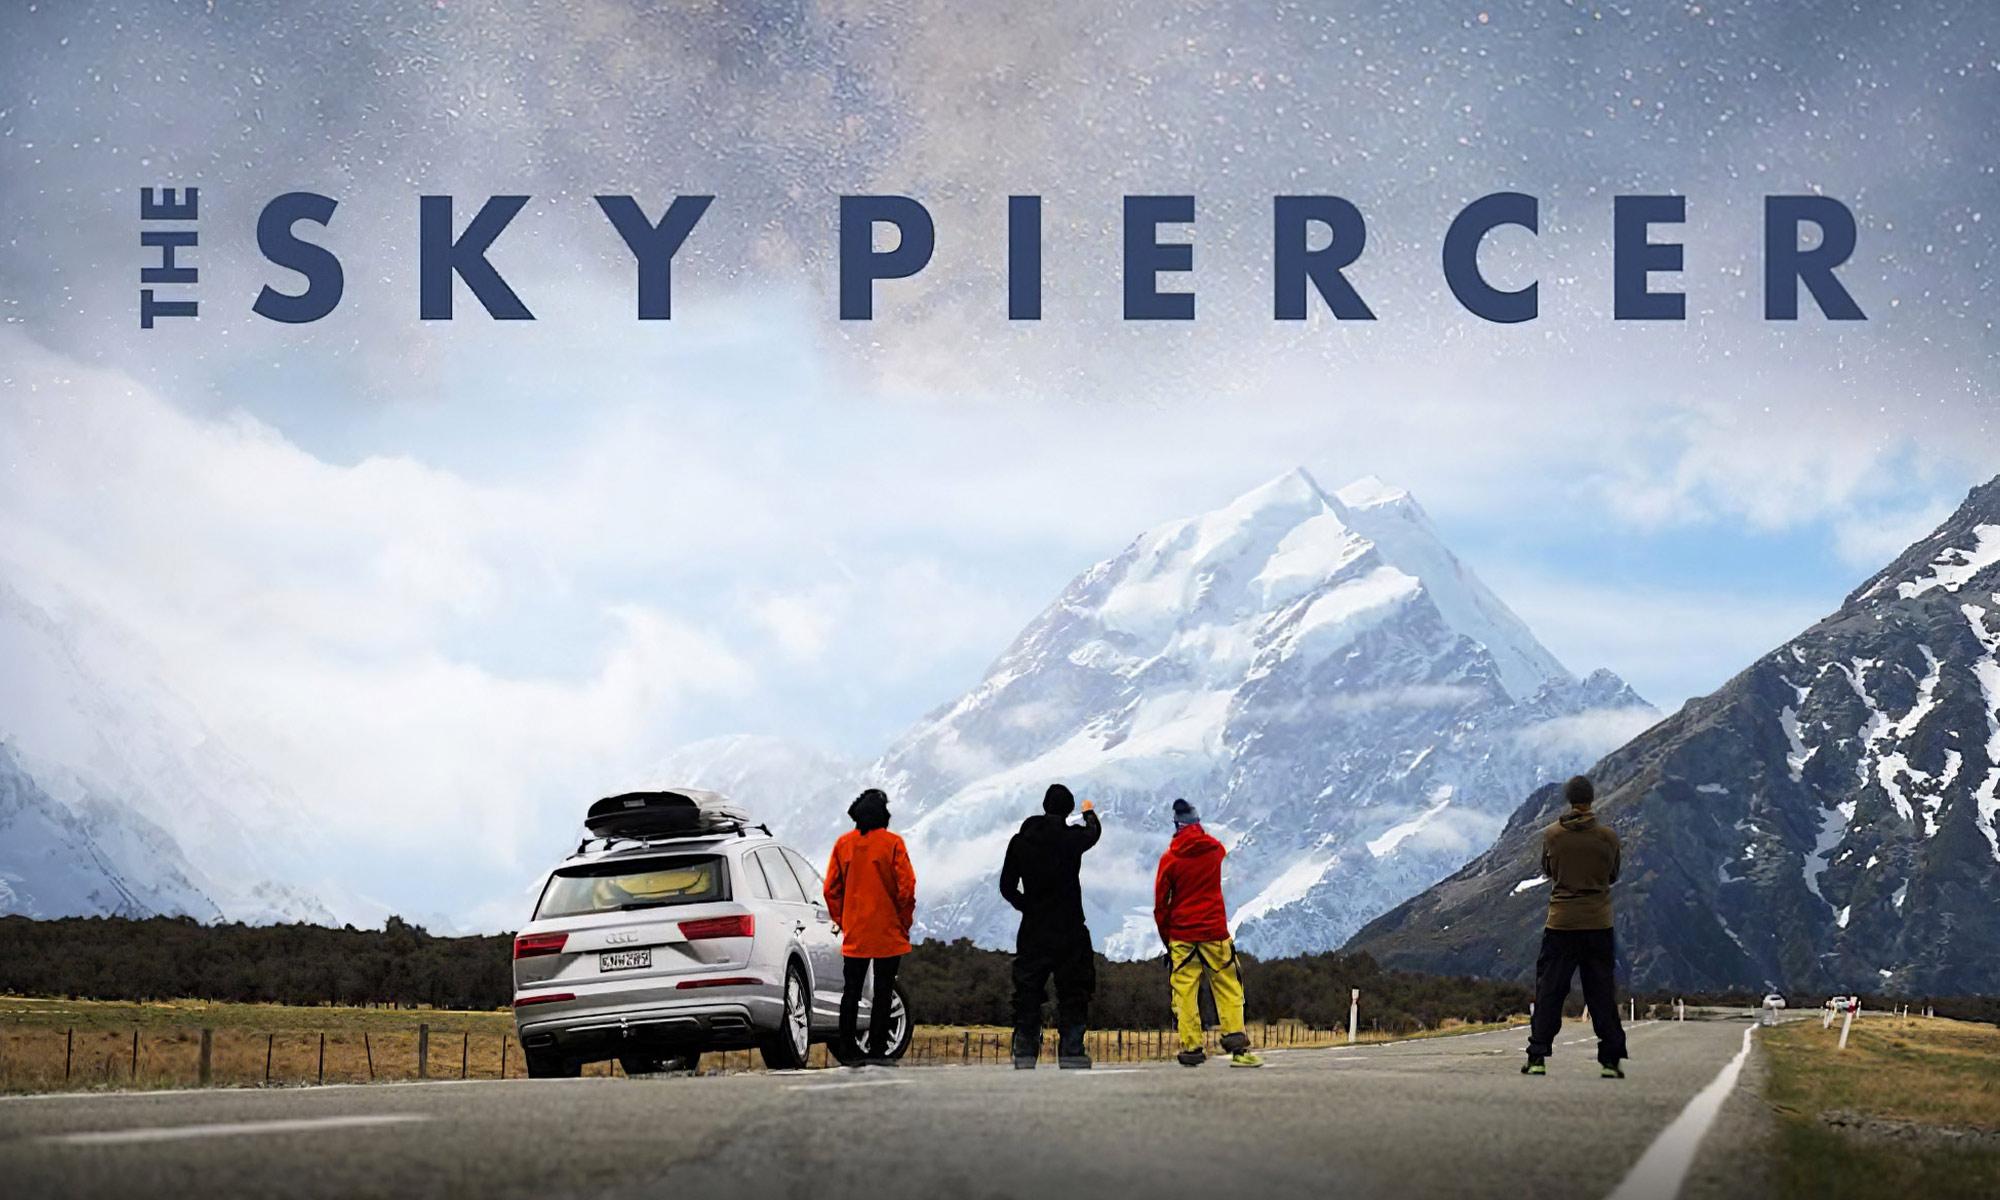 The sky piercer